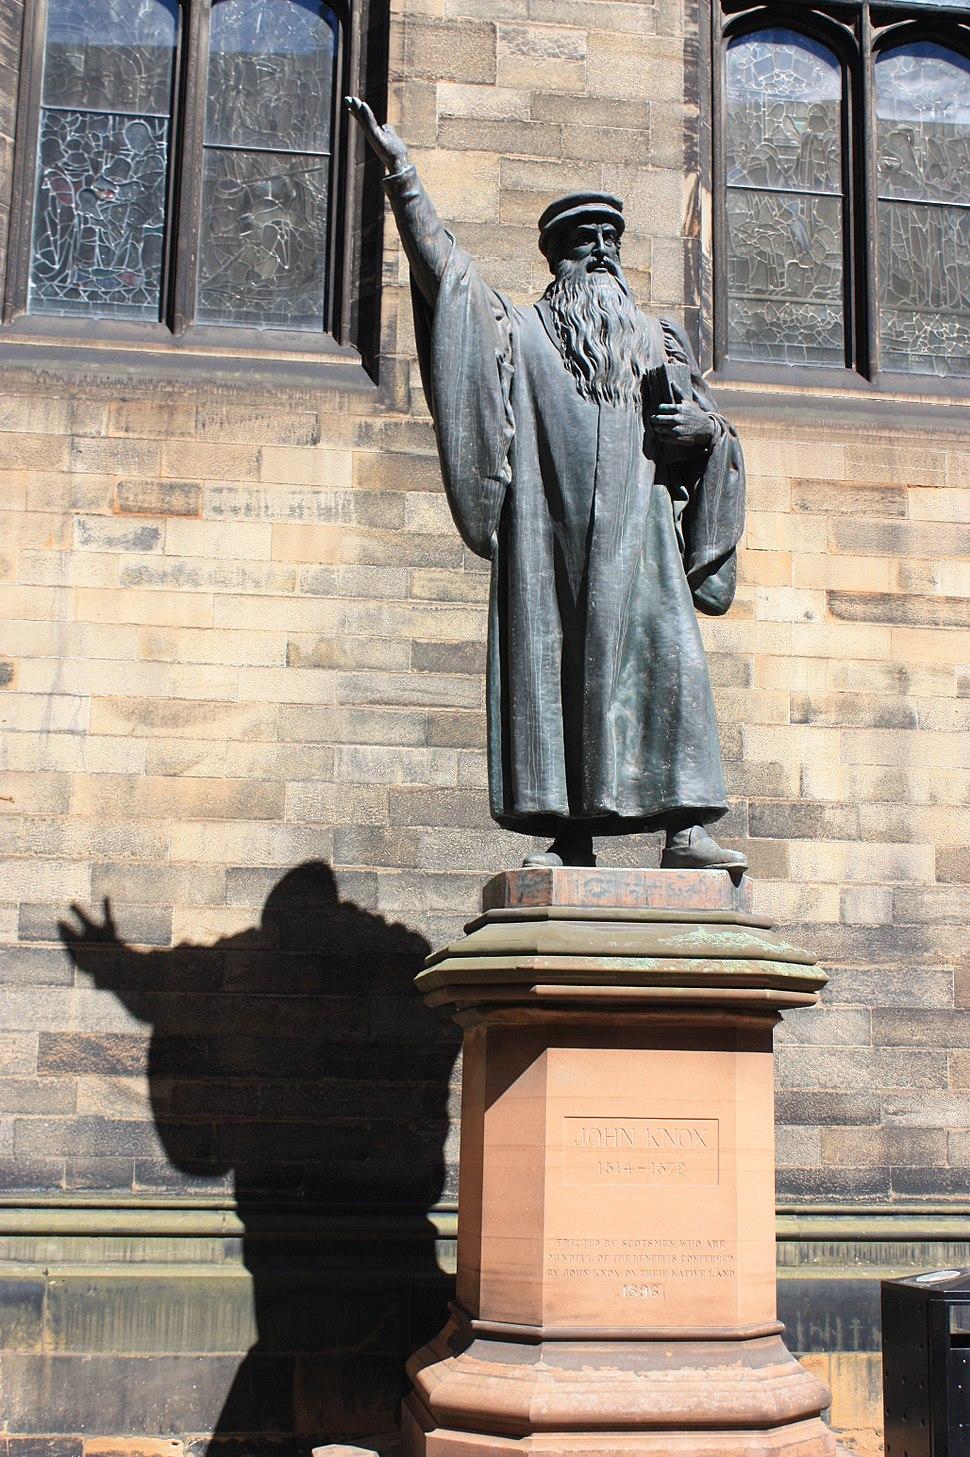 Statue of John Knox in New College Edinburgh